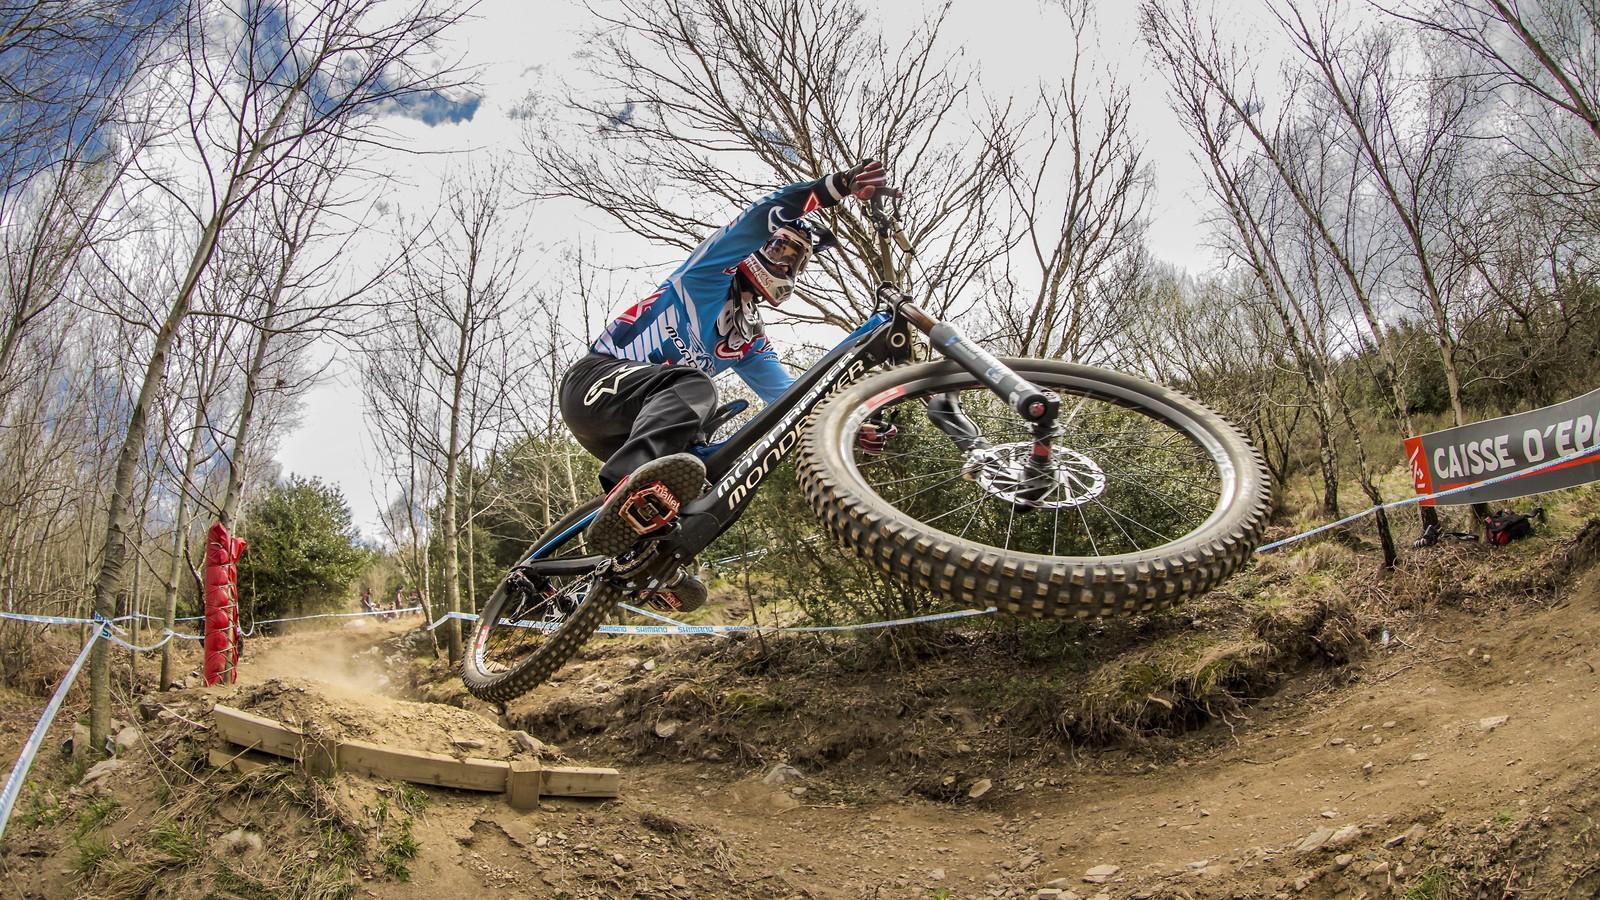 danny hart lourdes wc - phunkt.com - Mountain Biking Pictures - Vital MTB